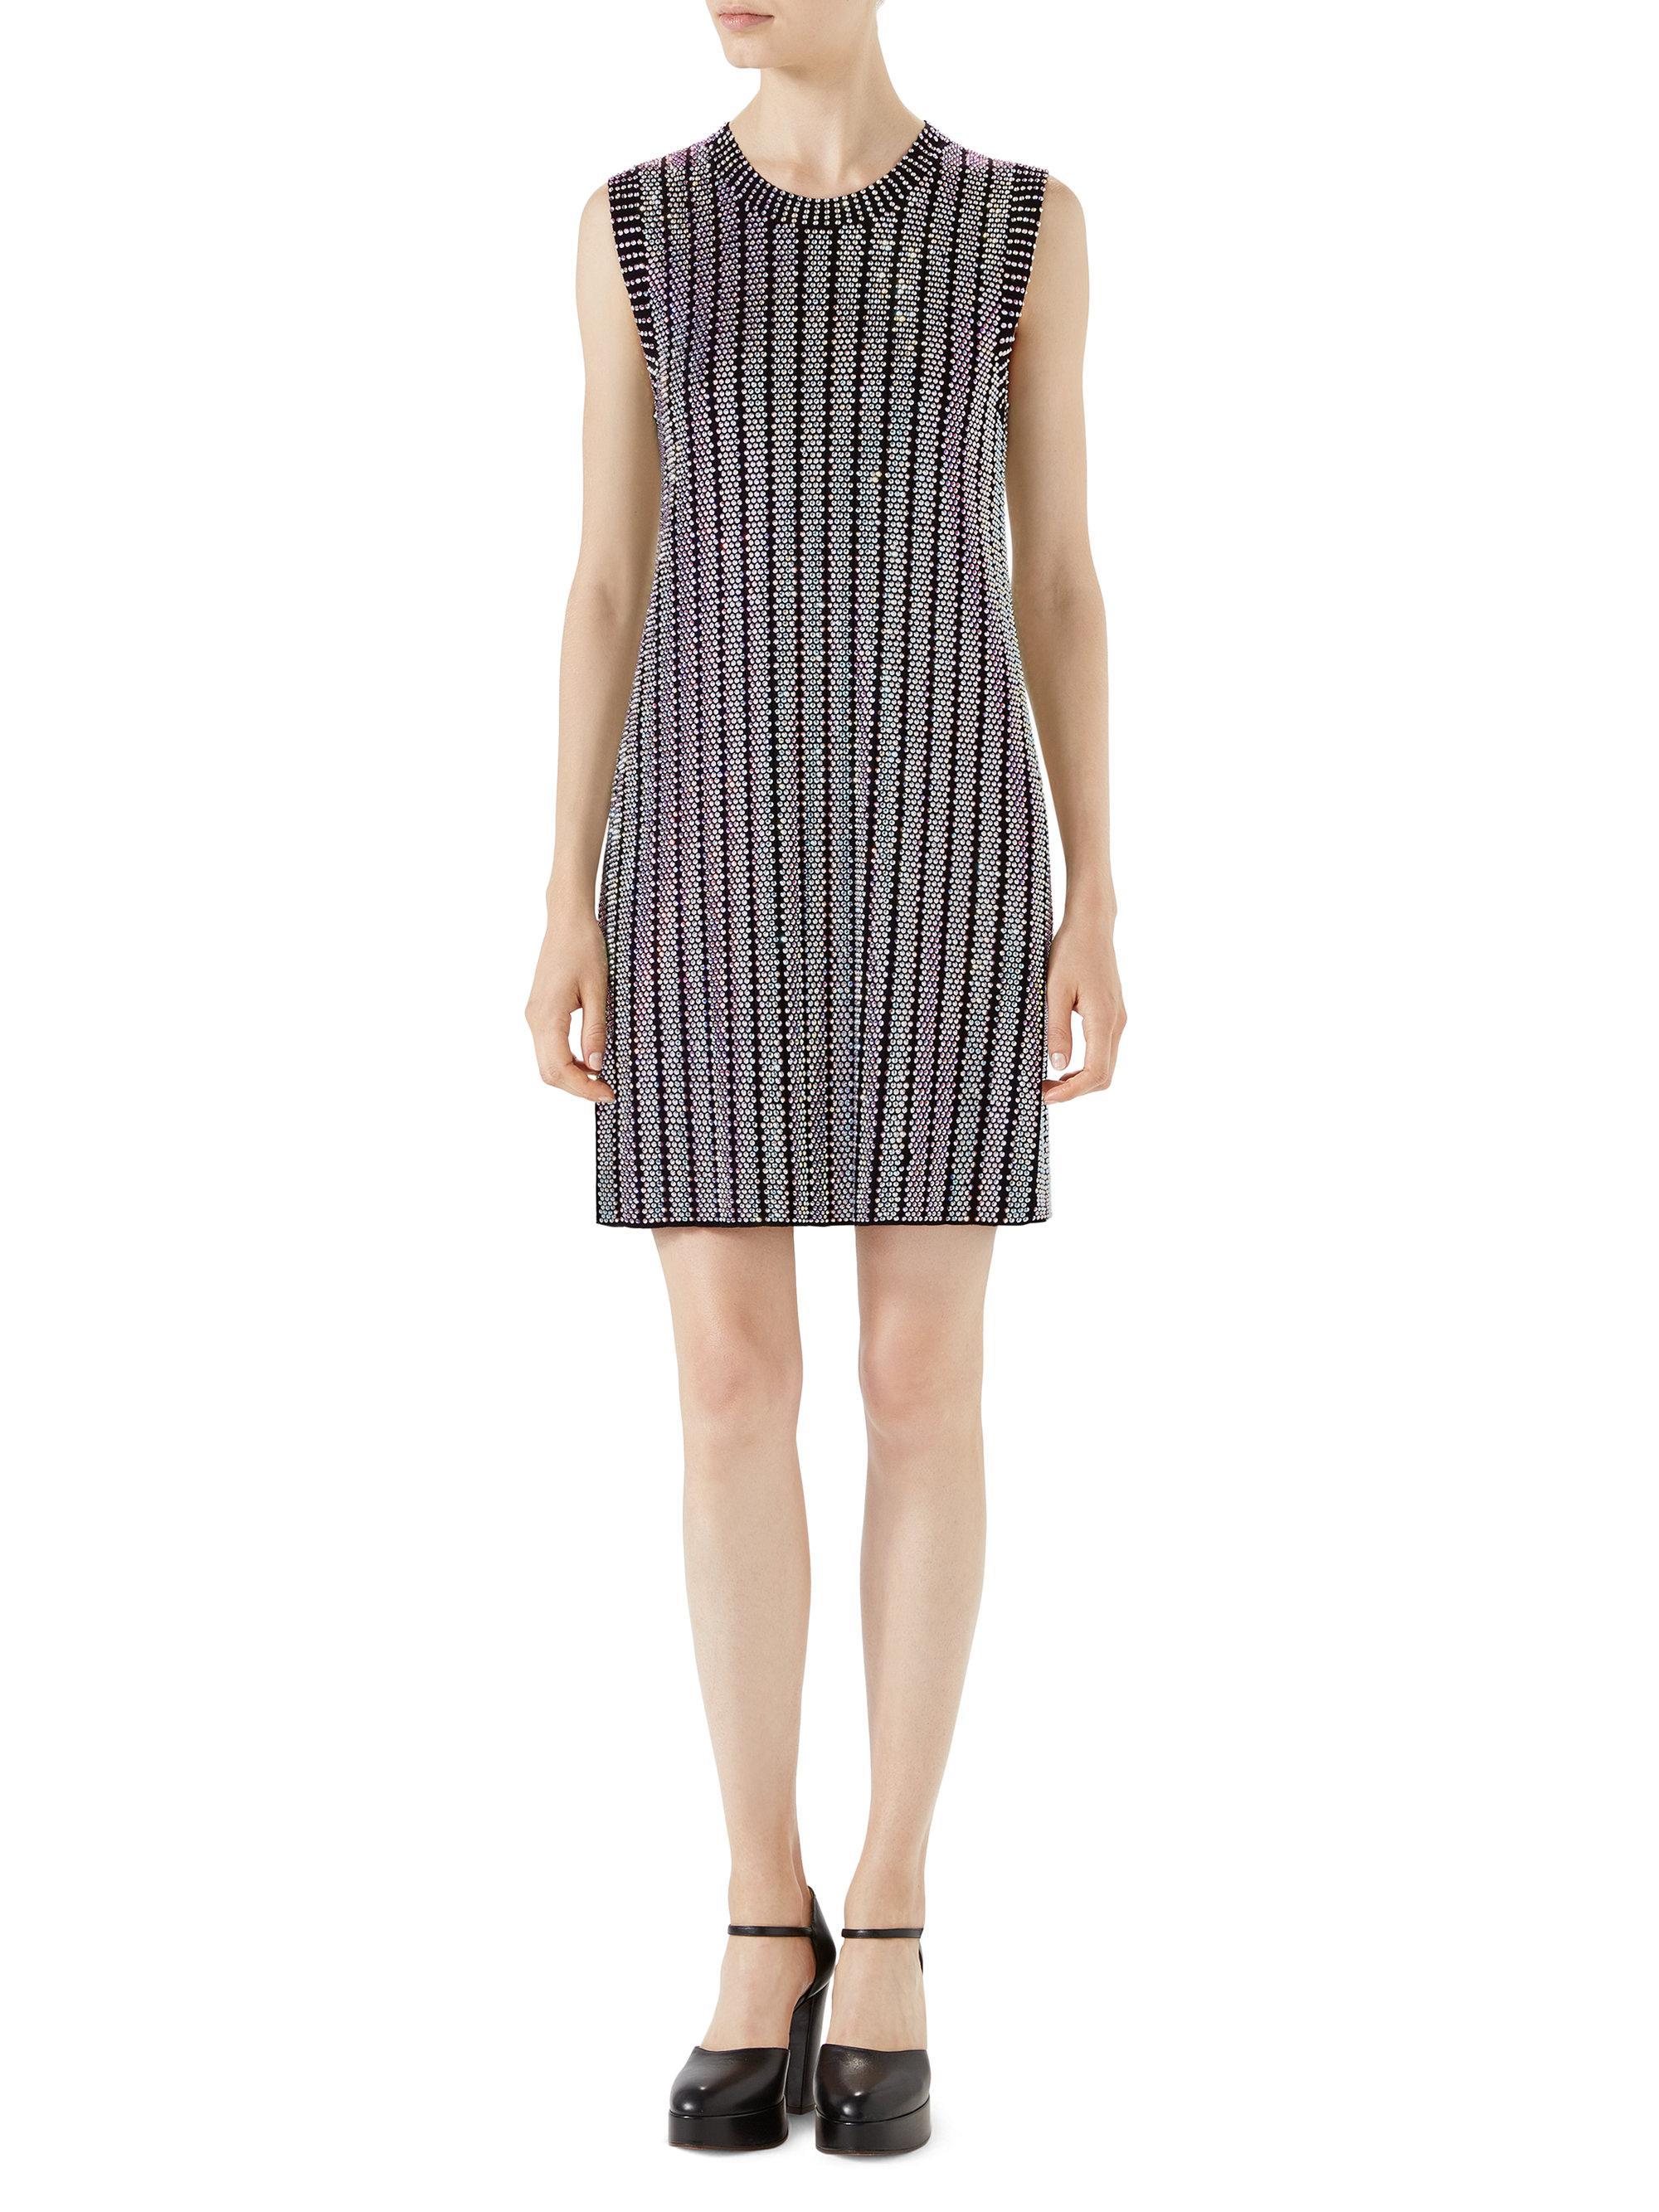 fb7c7c25f Gucci Crystal-embellished Sleeveless Shift Dress in Black - Lyst